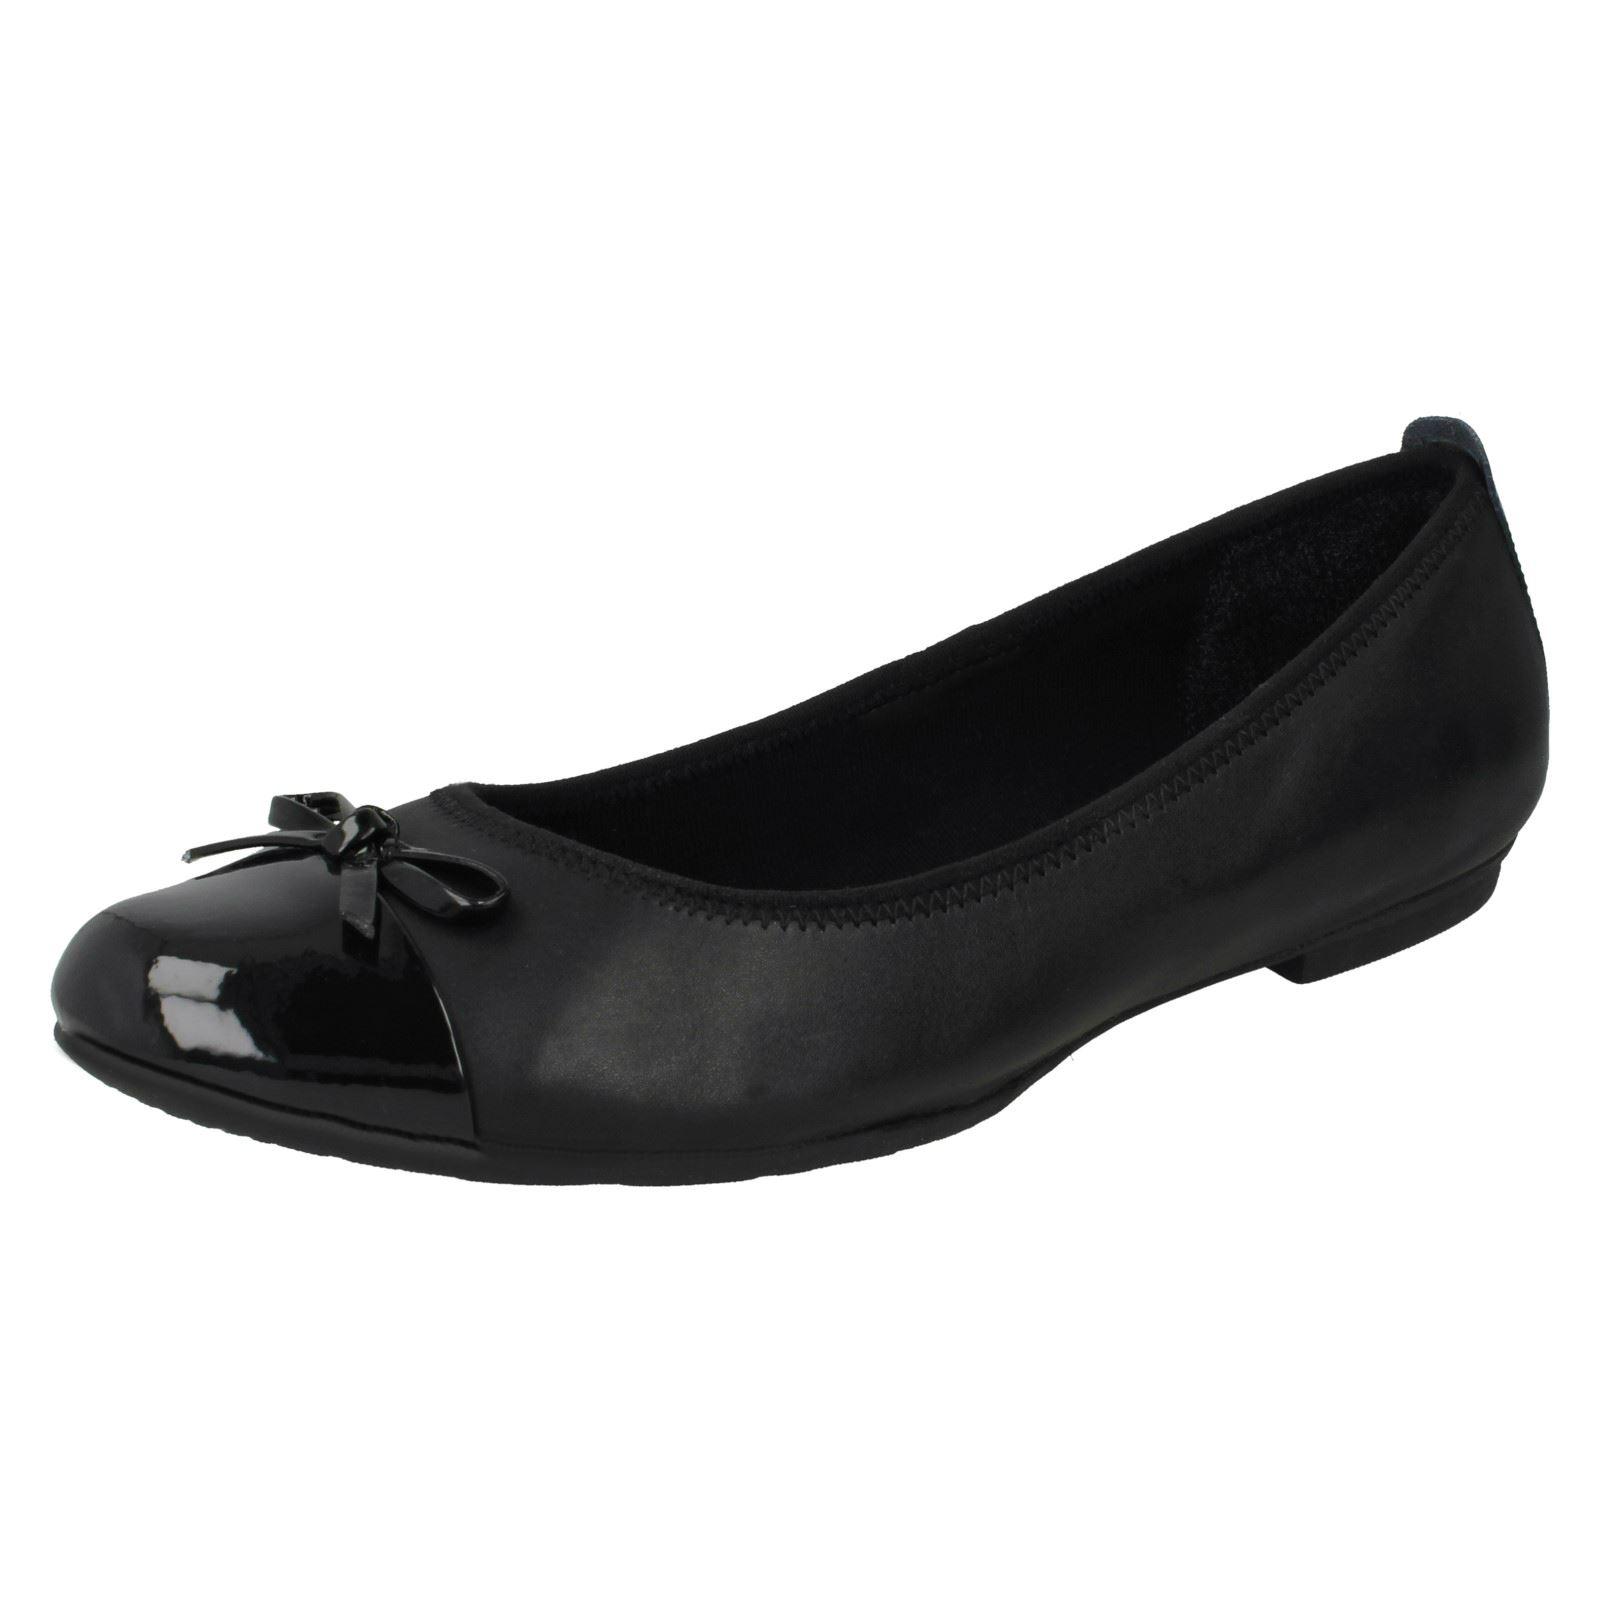 Girls Bootleg by Clarks Una Ivy Ballerina School Shoes